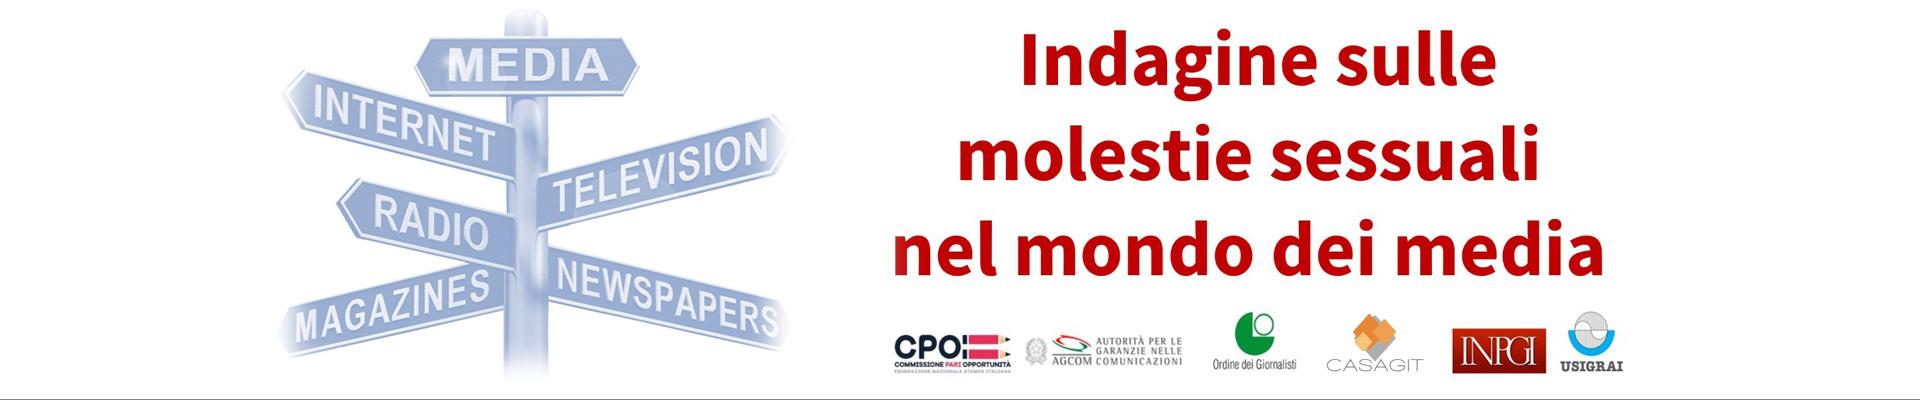 banner-indagine-molestie